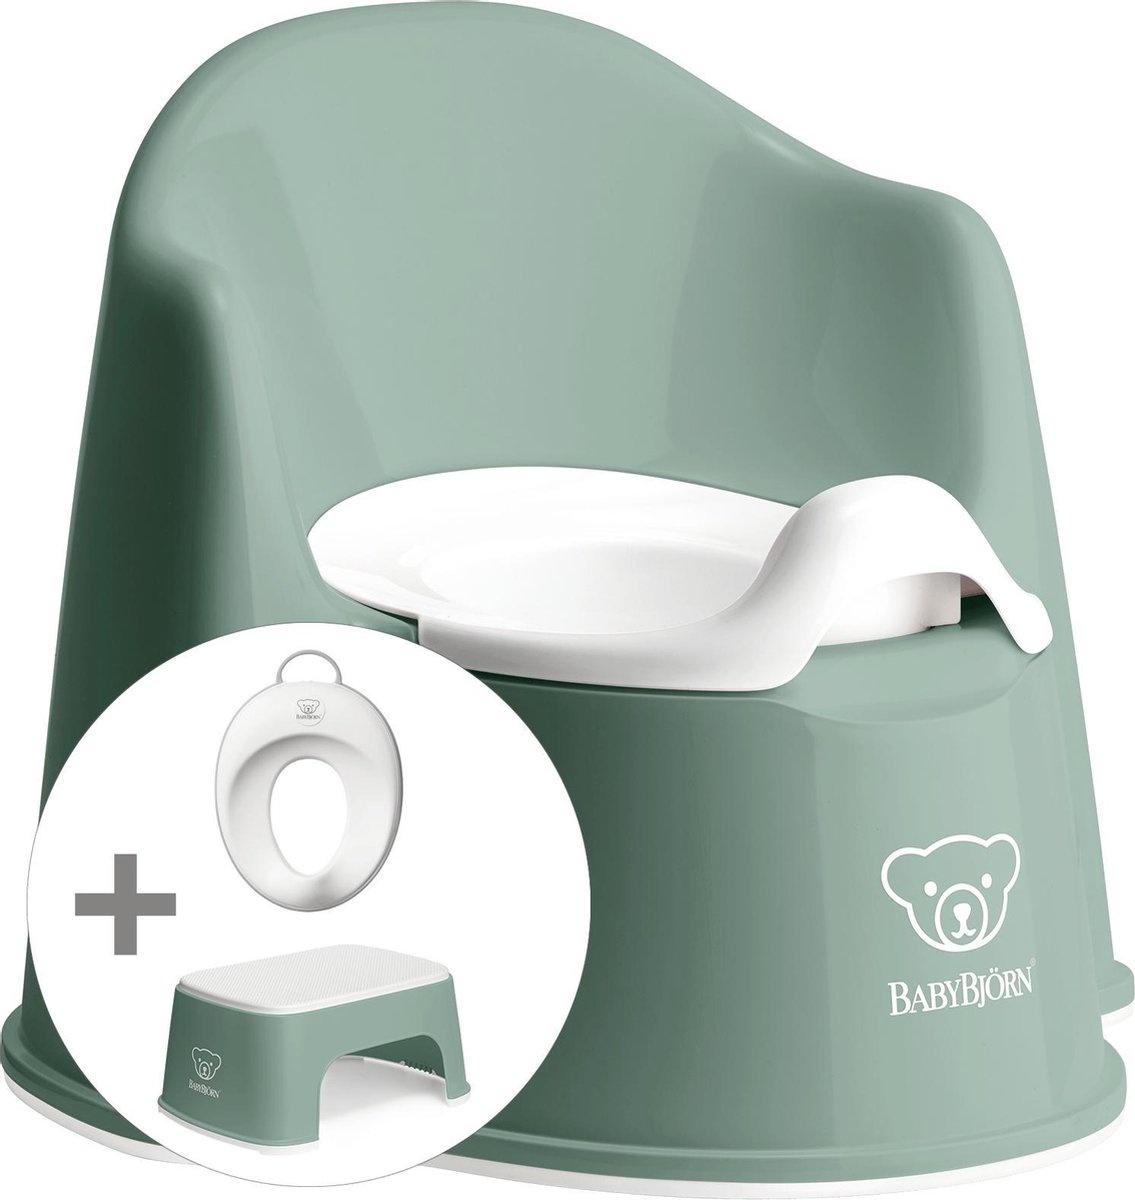 BABYBJÖRN Babybjörn startpakket bestaande uit Plaspotje Zetel, Opstapkrukje en Toilettrainer - Diepg